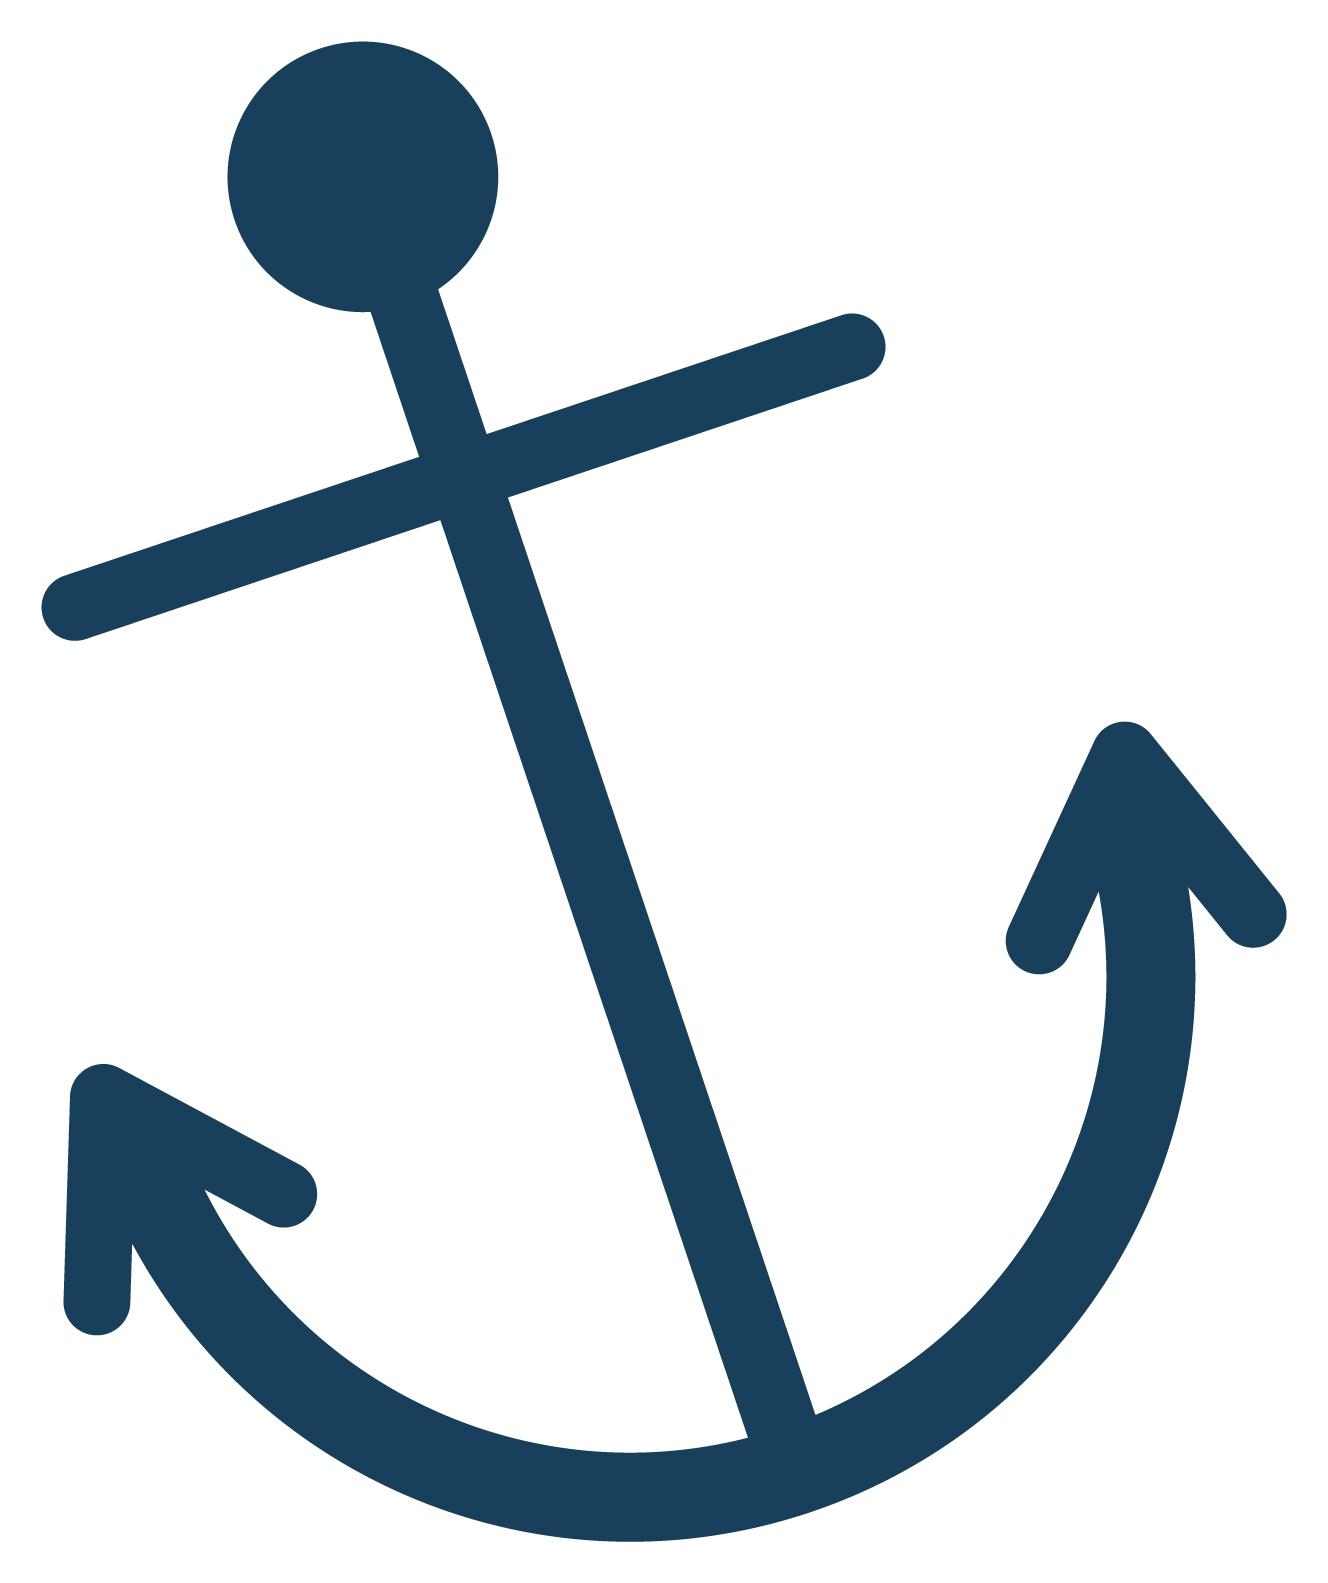 Anchor clipart cute. Clip art free images